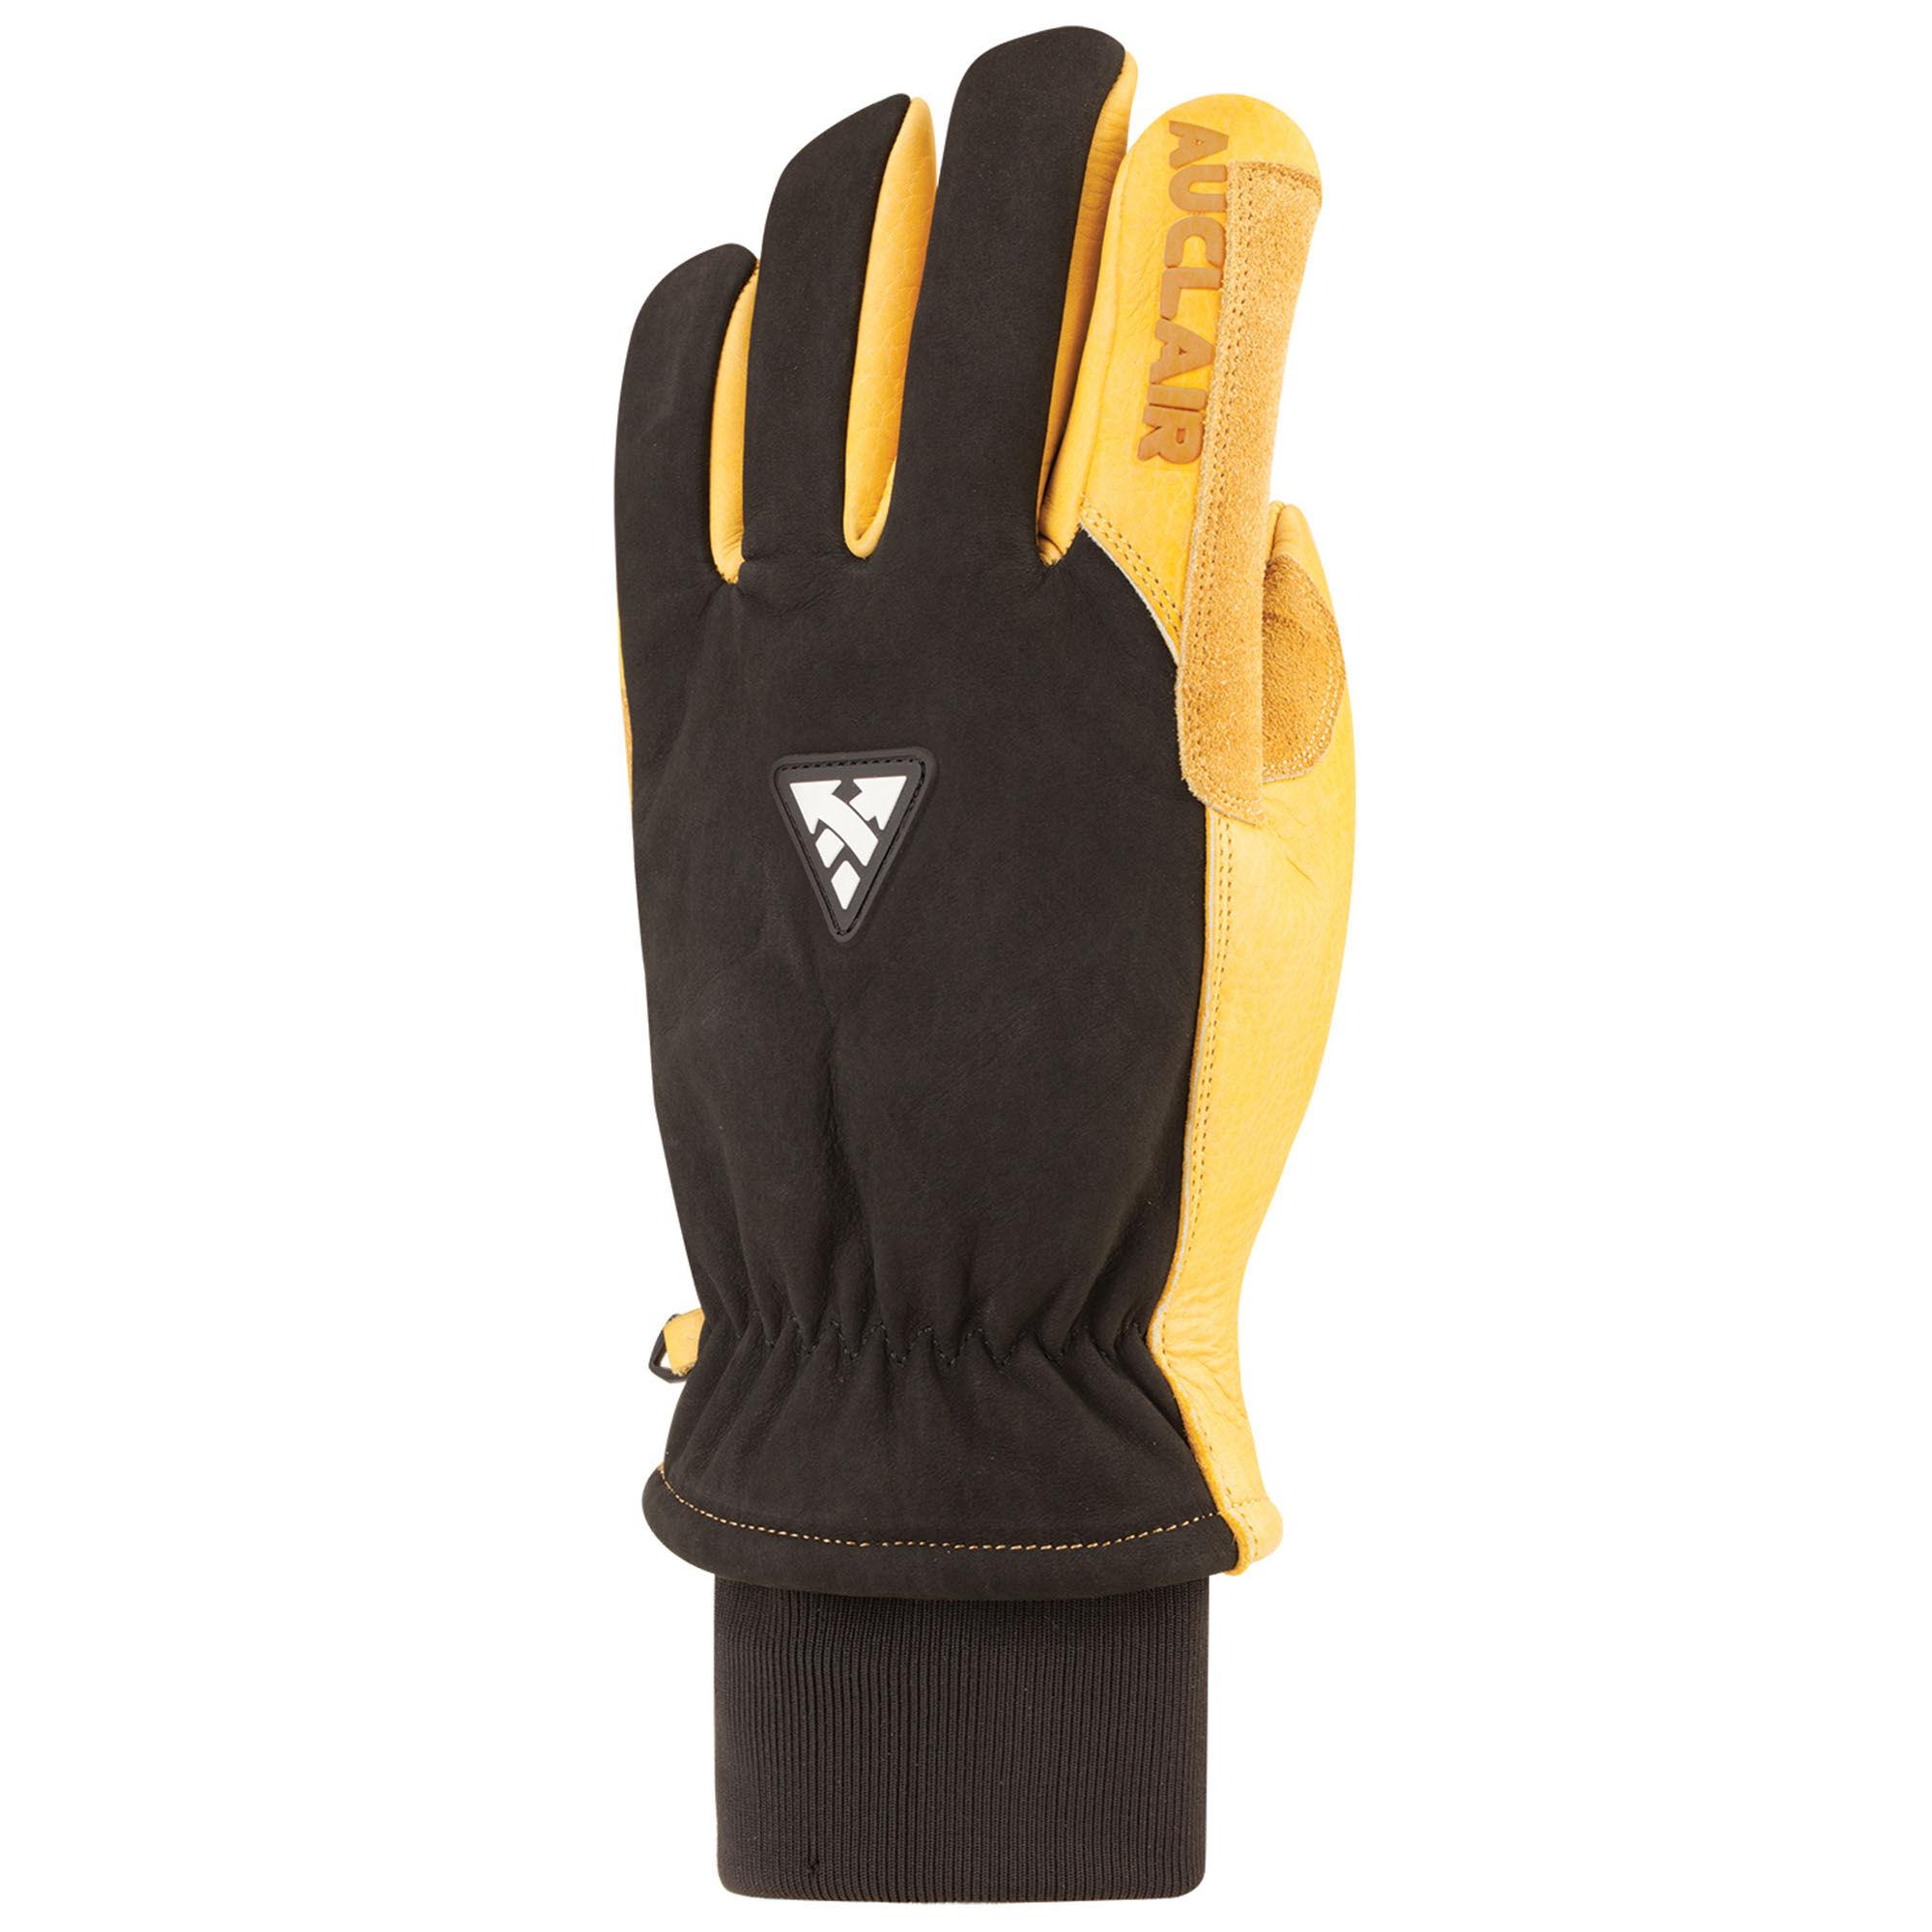 Auclair Sports Men's Western Ops Gloves  - Black/Gold - Size: Medium